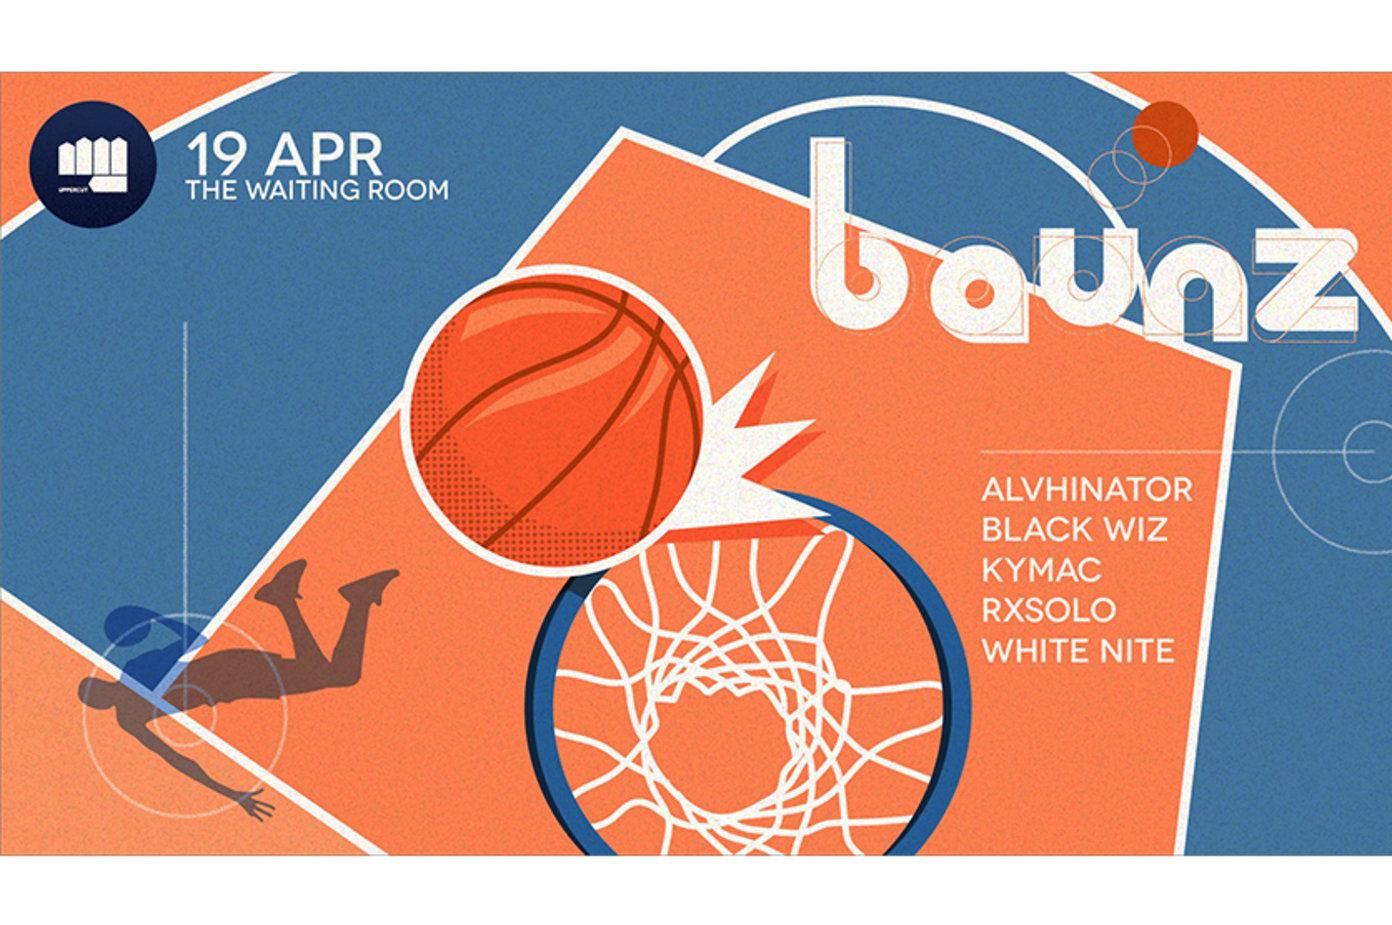 Uppercut Presents BAUNZ